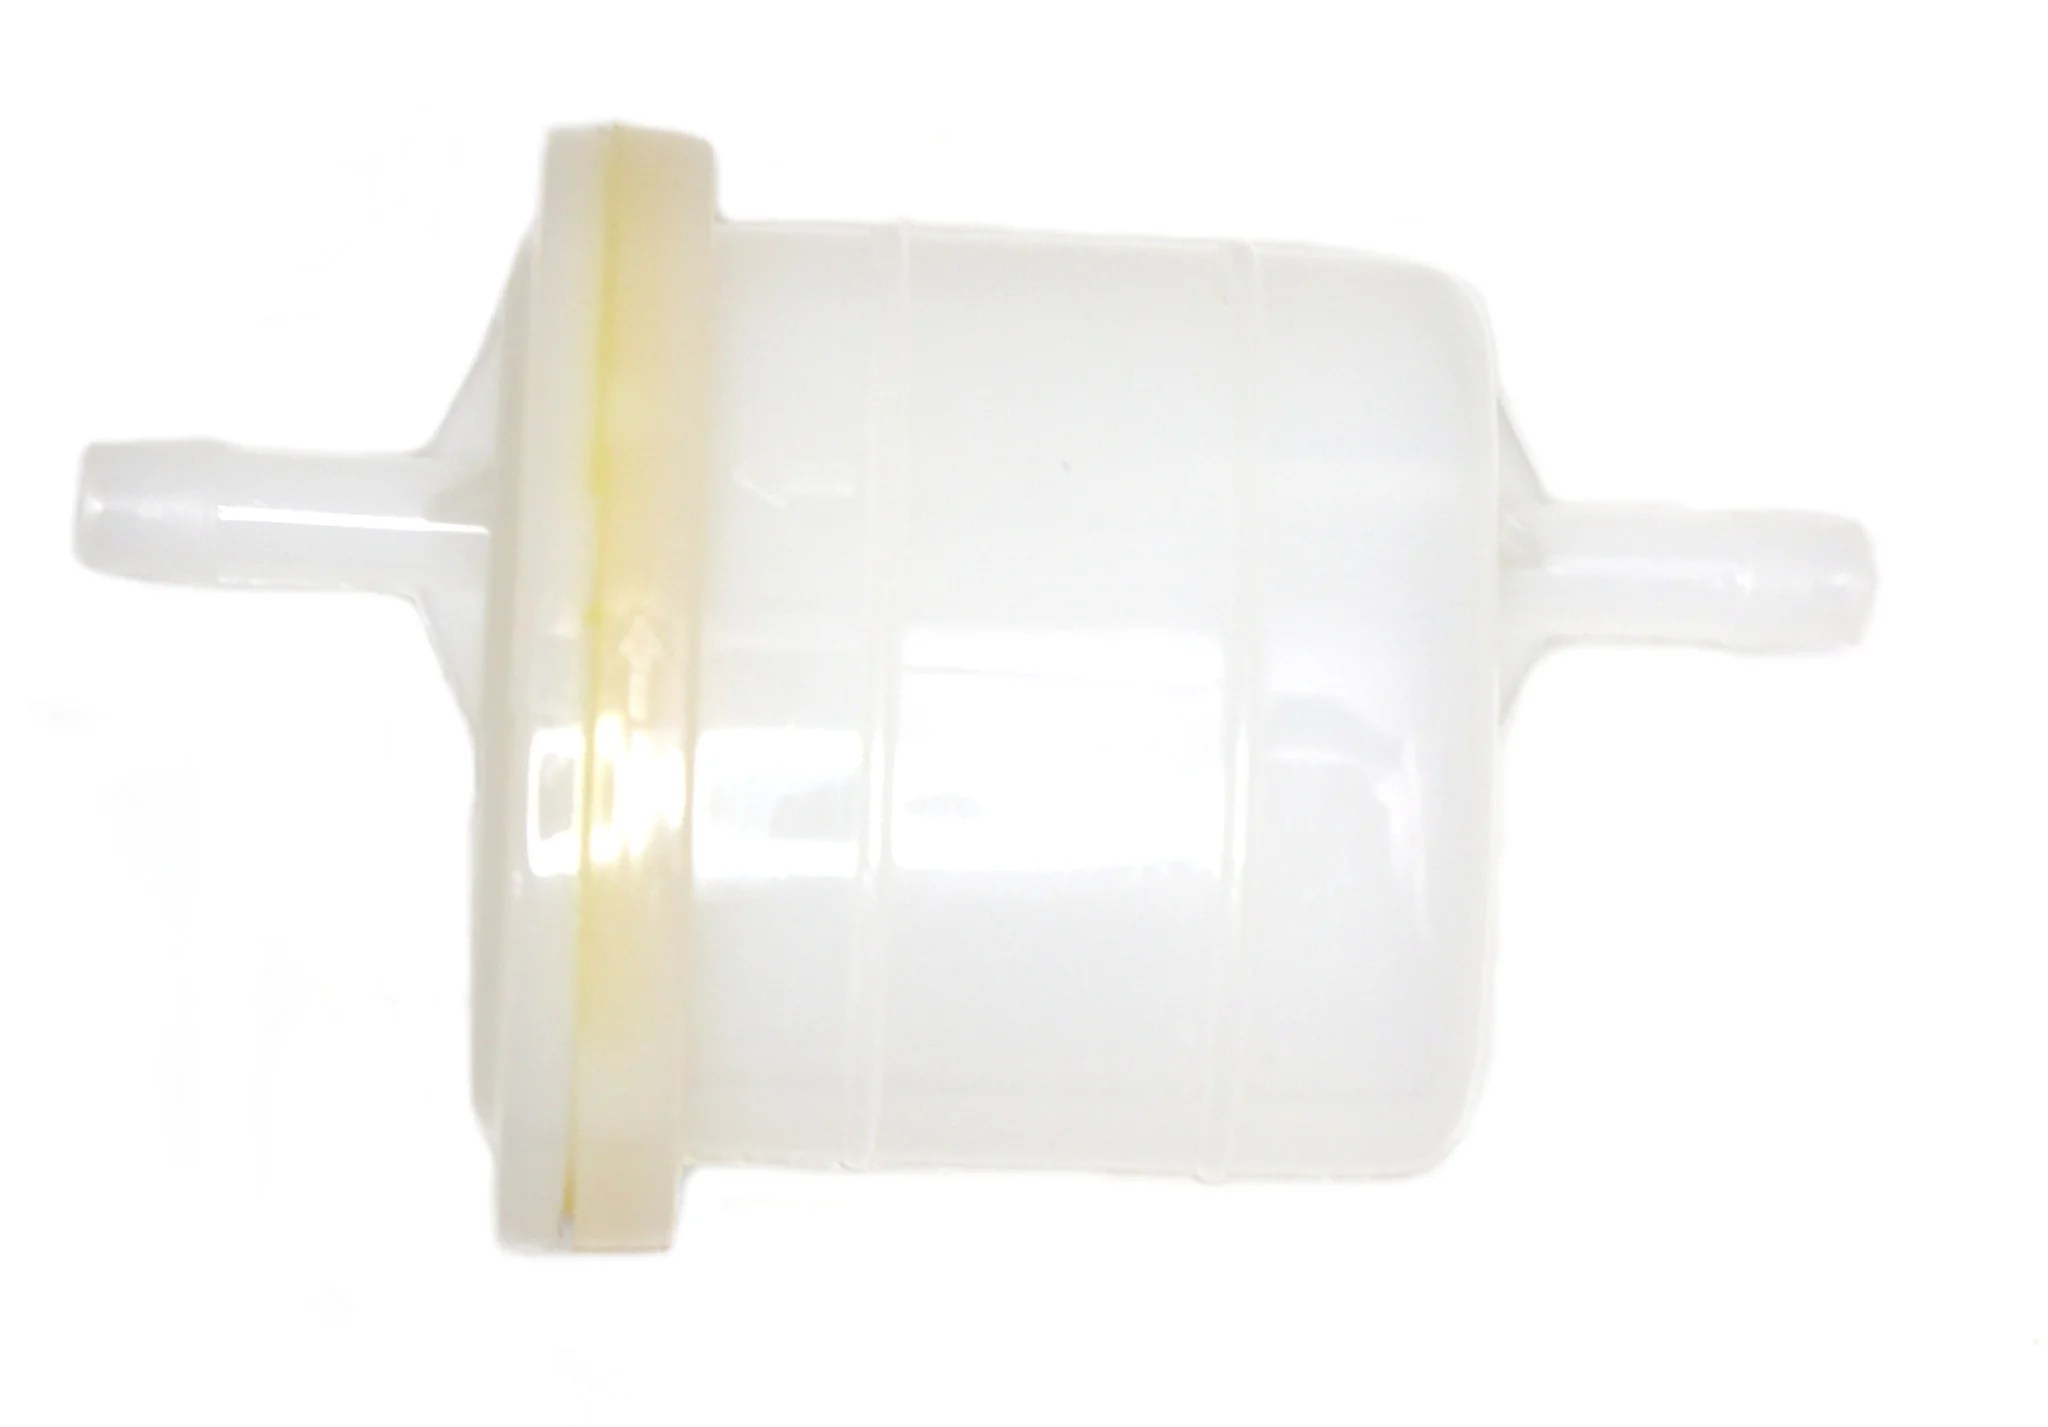 medium resolution of  yamaha pwc waverunner gas fuel filter 6k8 24560 10 00 6k8 24560